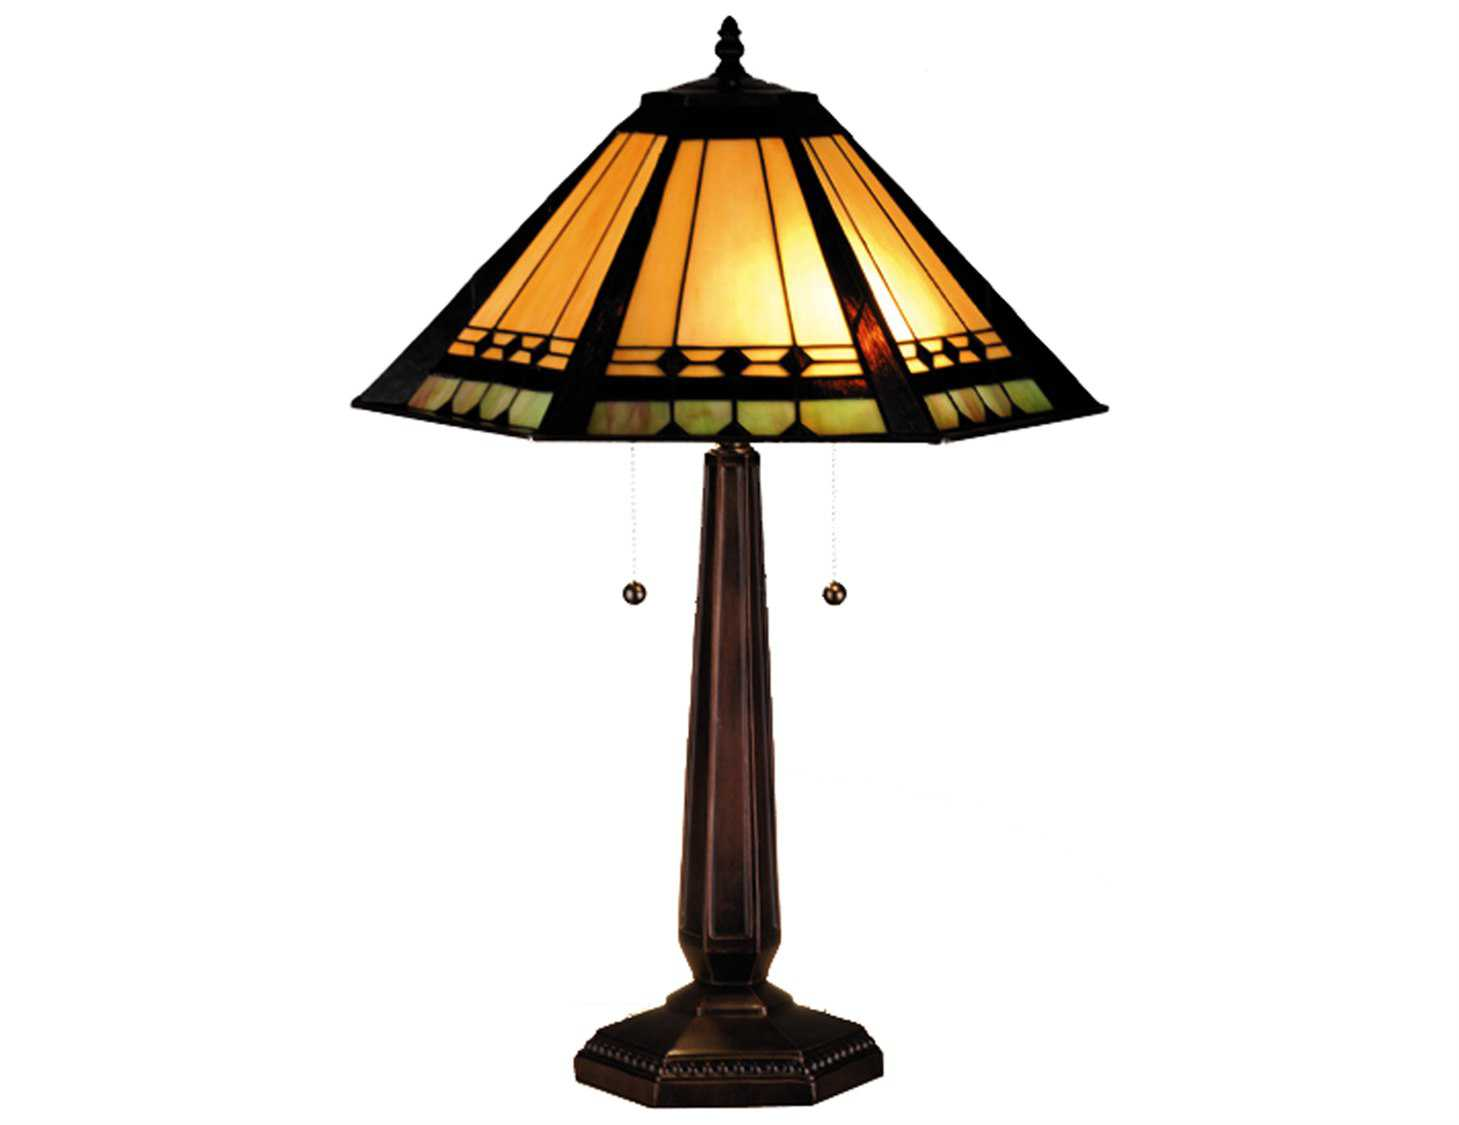 meyda tiffany albuquerque multi color table lamp 82313. Black Bedroom Furniture Sets. Home Design Ideas